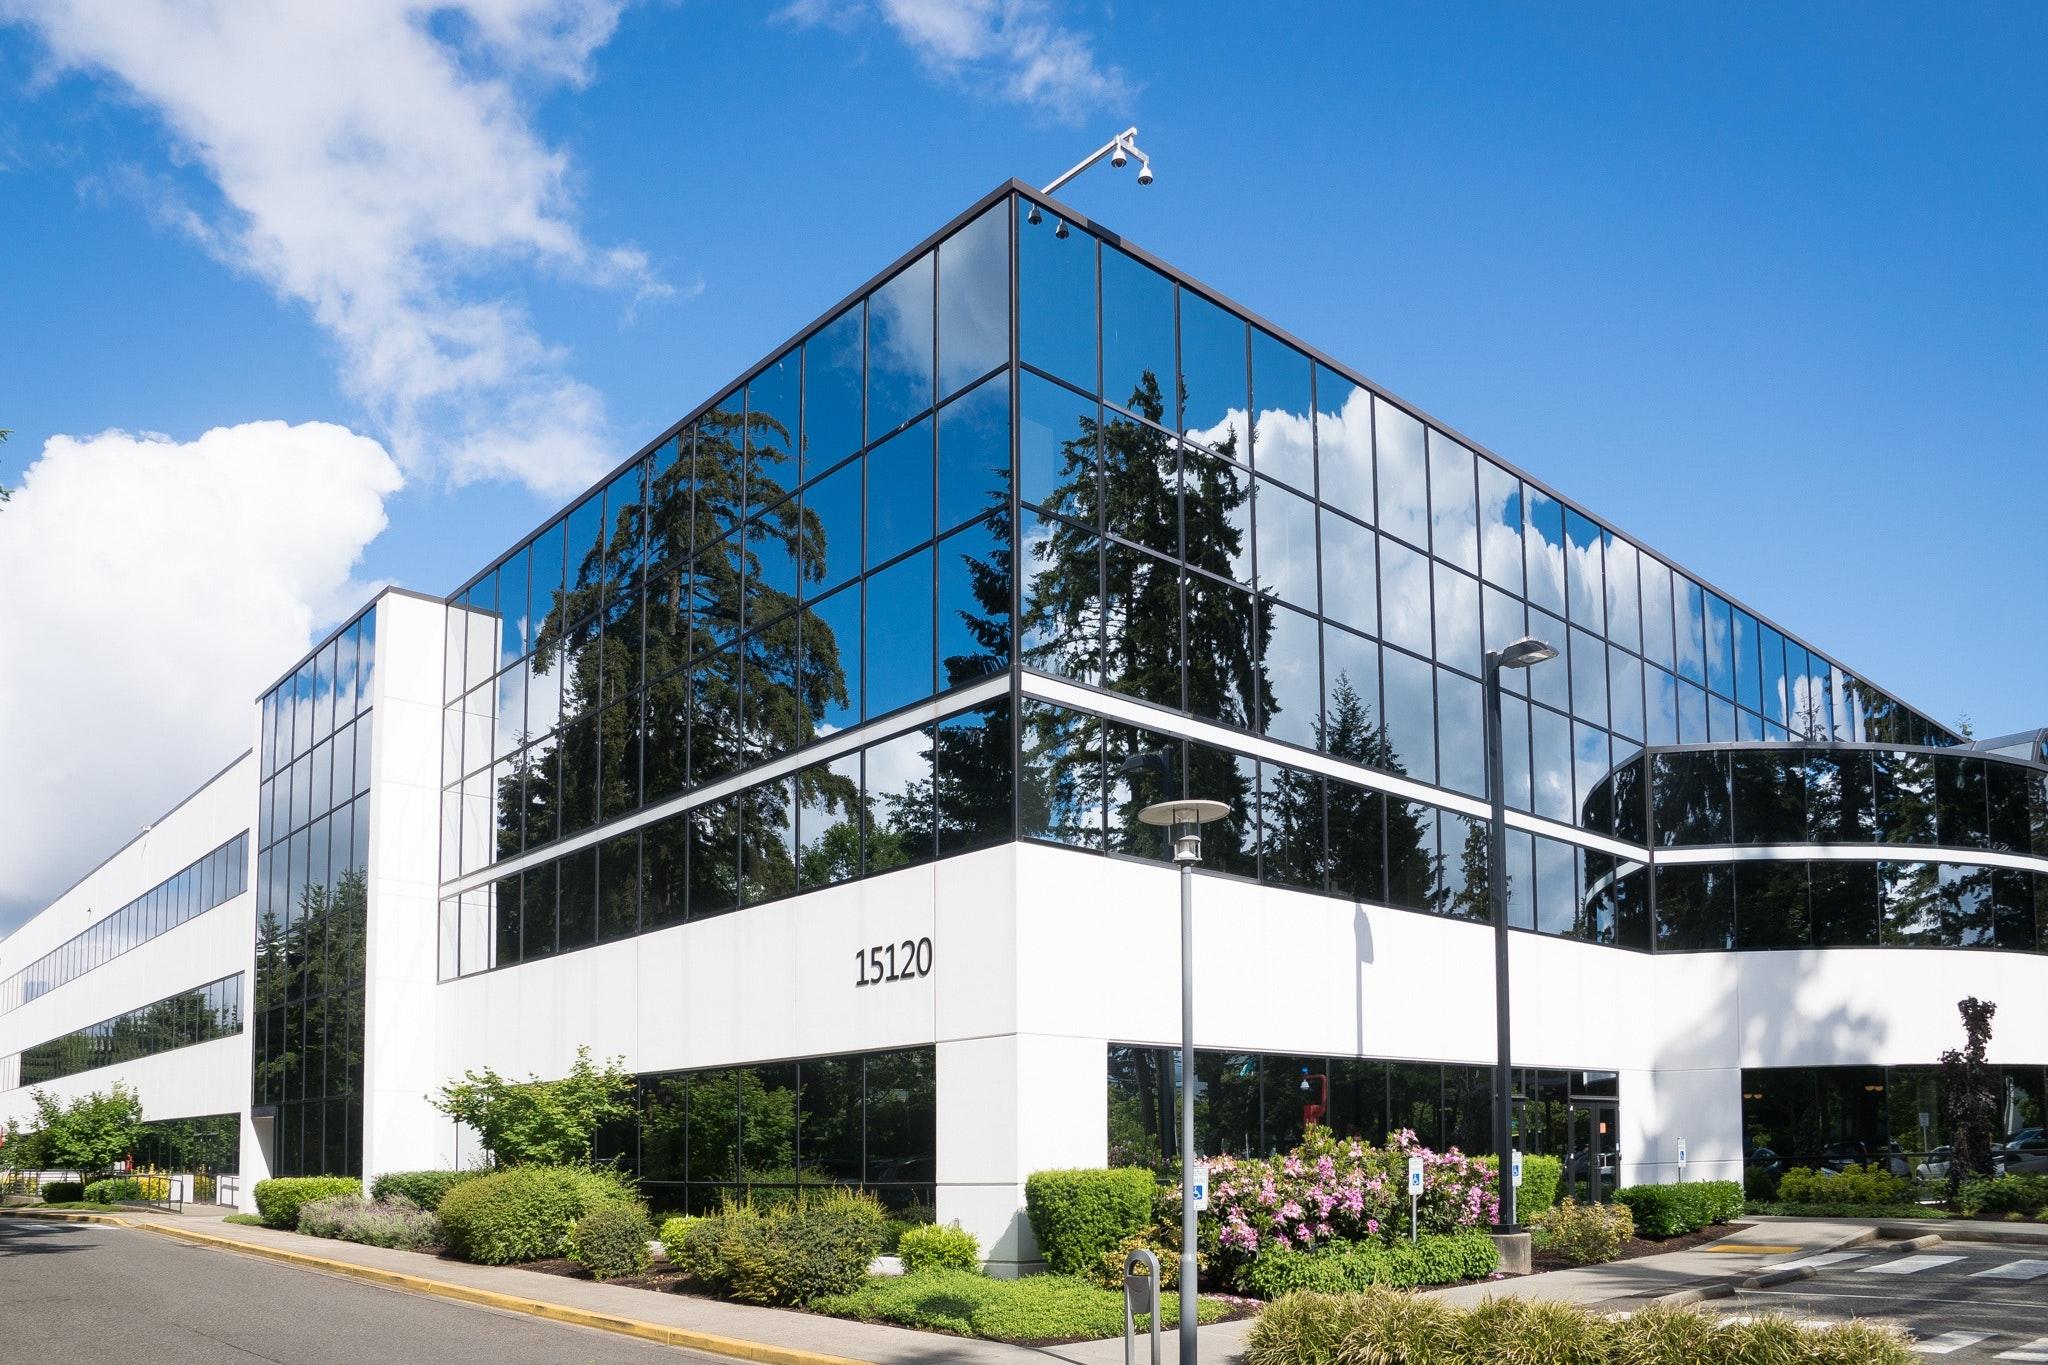 White 15120 Building